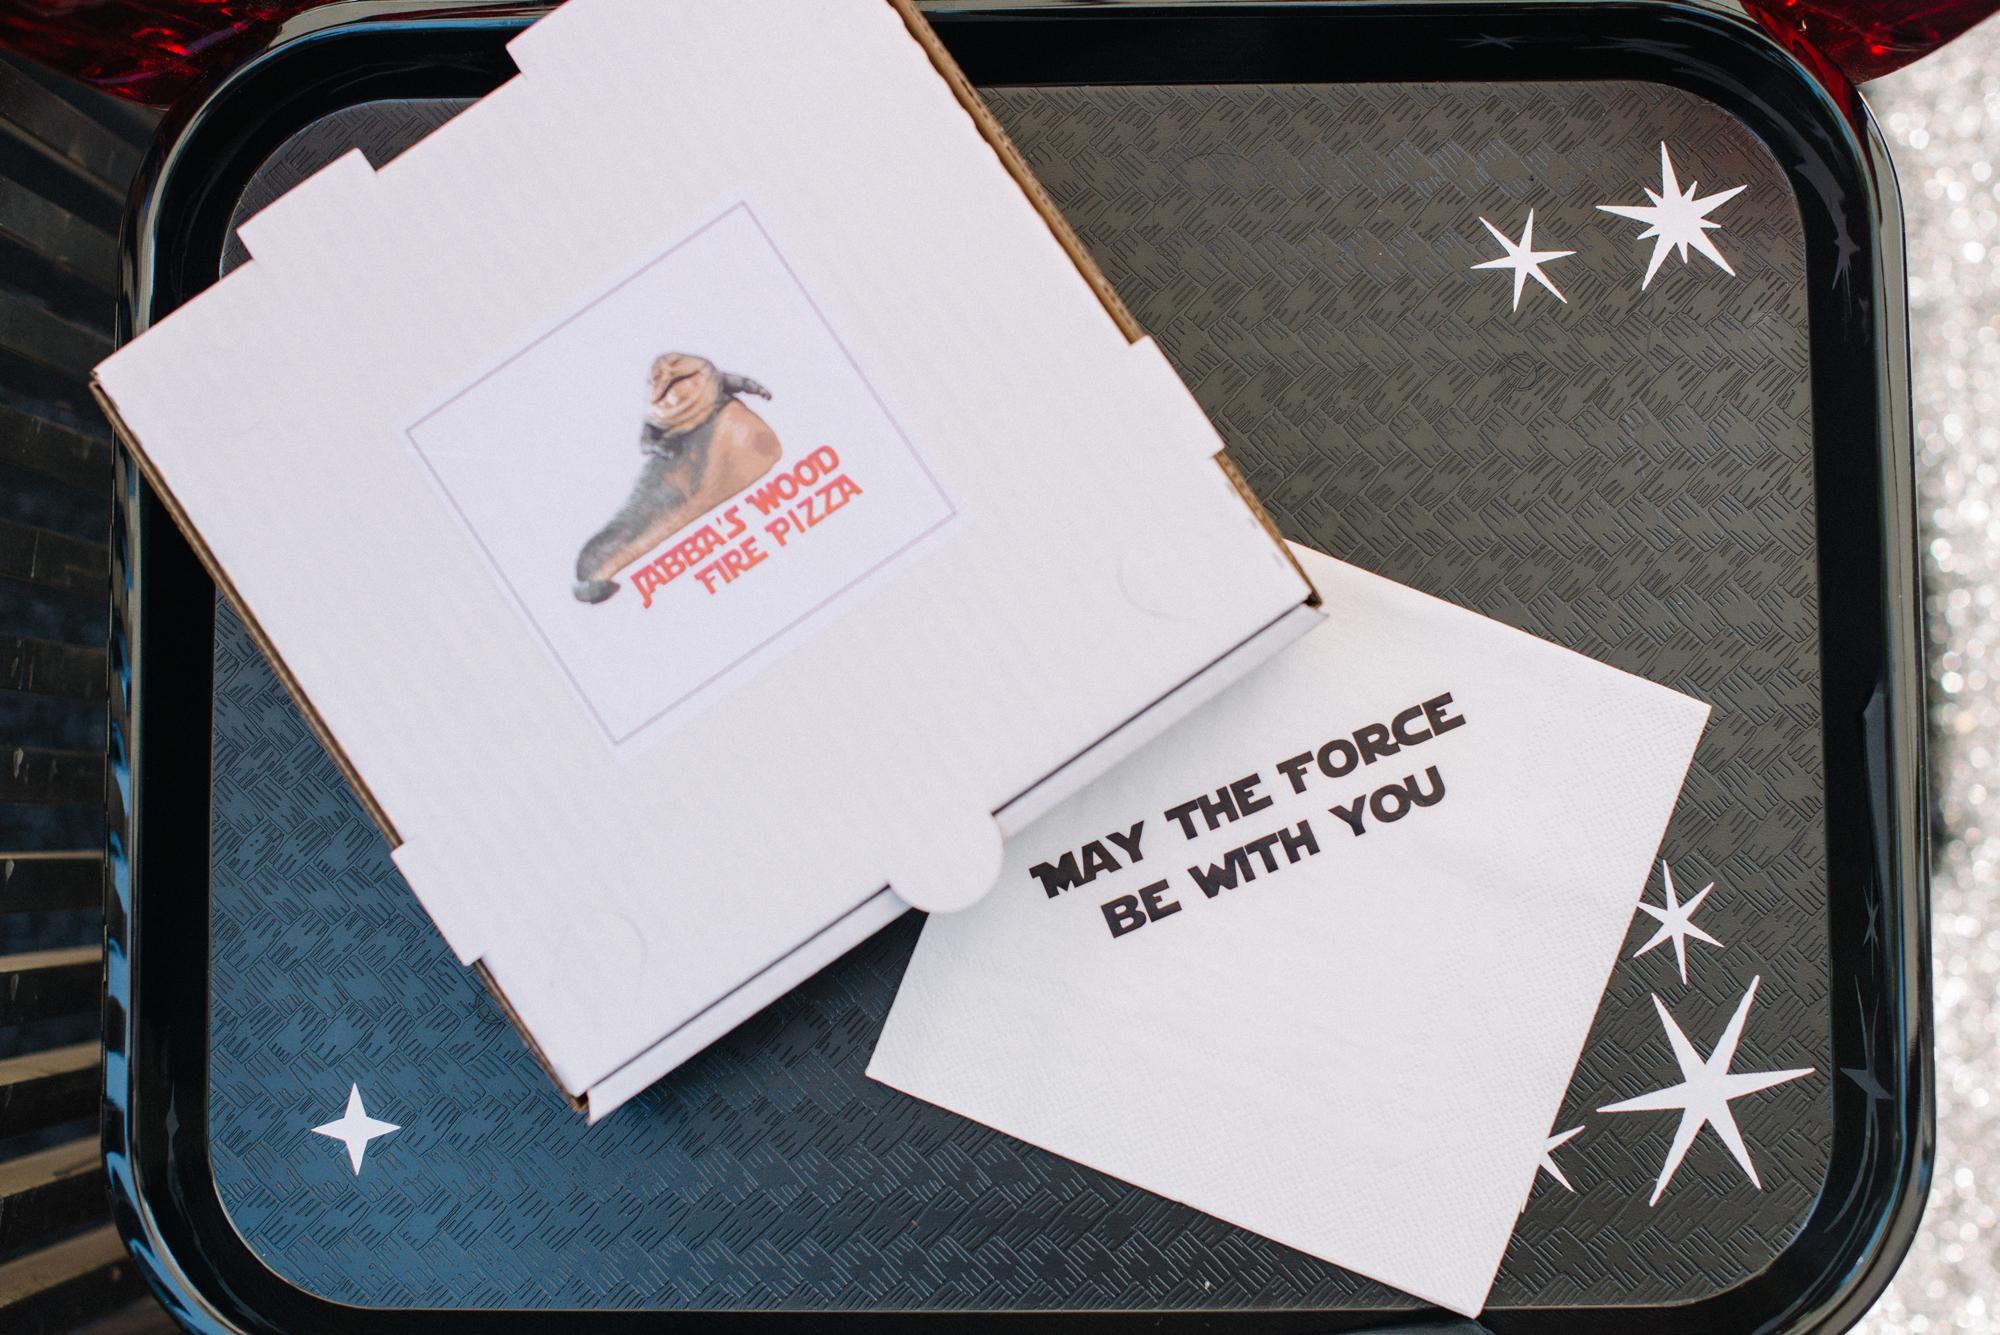 tarynco-events-starwars-themed-kids-birthday-party-pizza-boxes.jpg